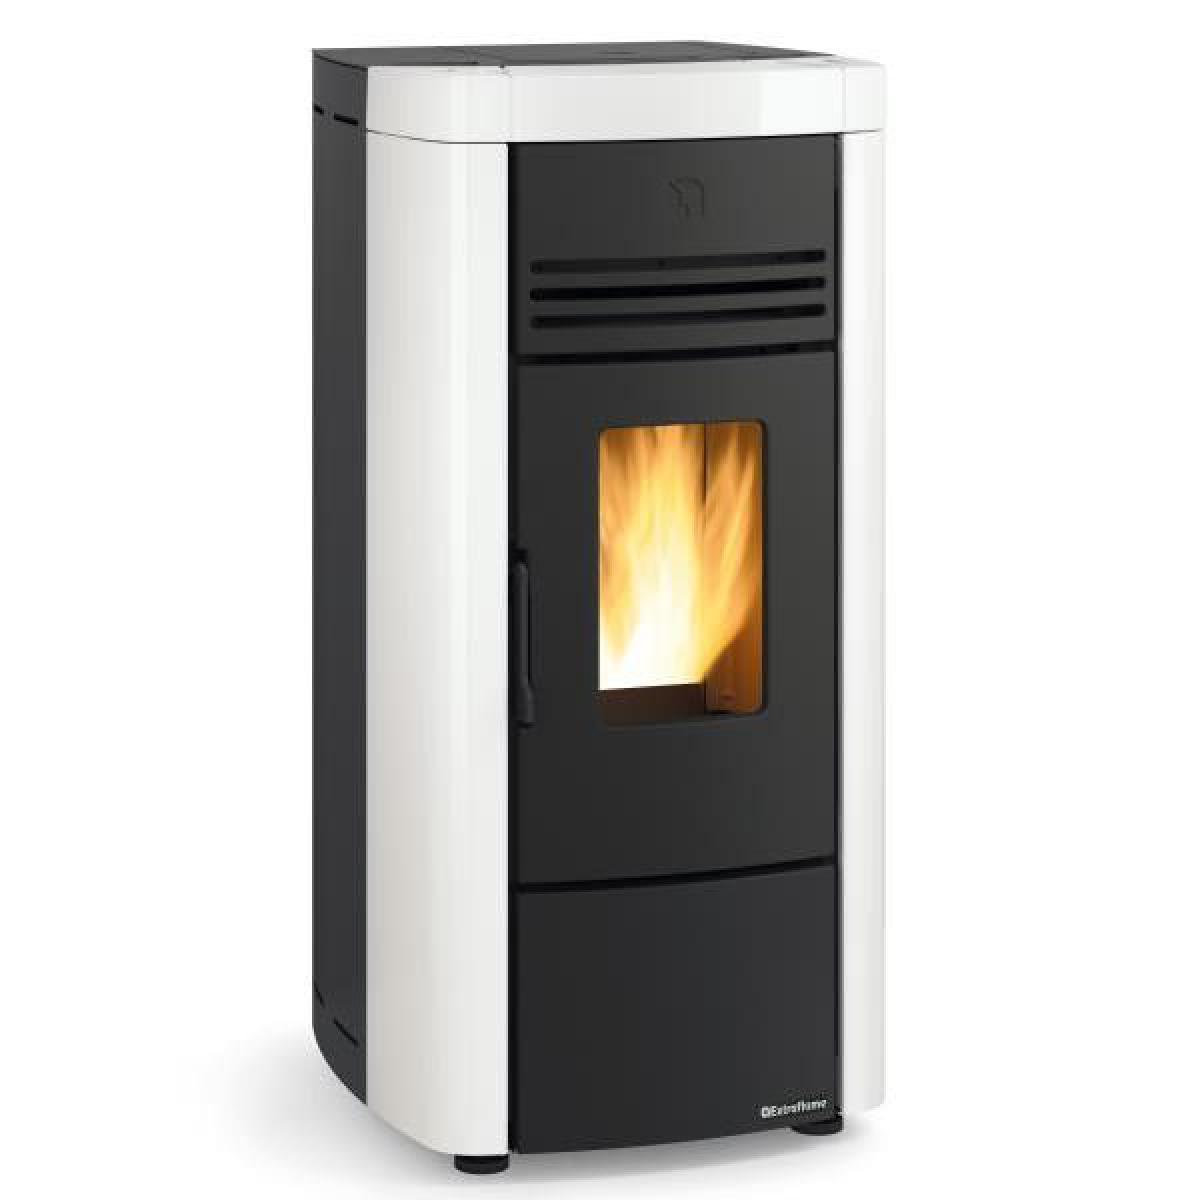 La Nordica 1282404-POELE A GRANULES ETANCHE-8KW-A+-FLAMME VERTE 7*-CSTB-FOYER FONT NORDICA EXTRAFLAME - ANGELASPBLANC